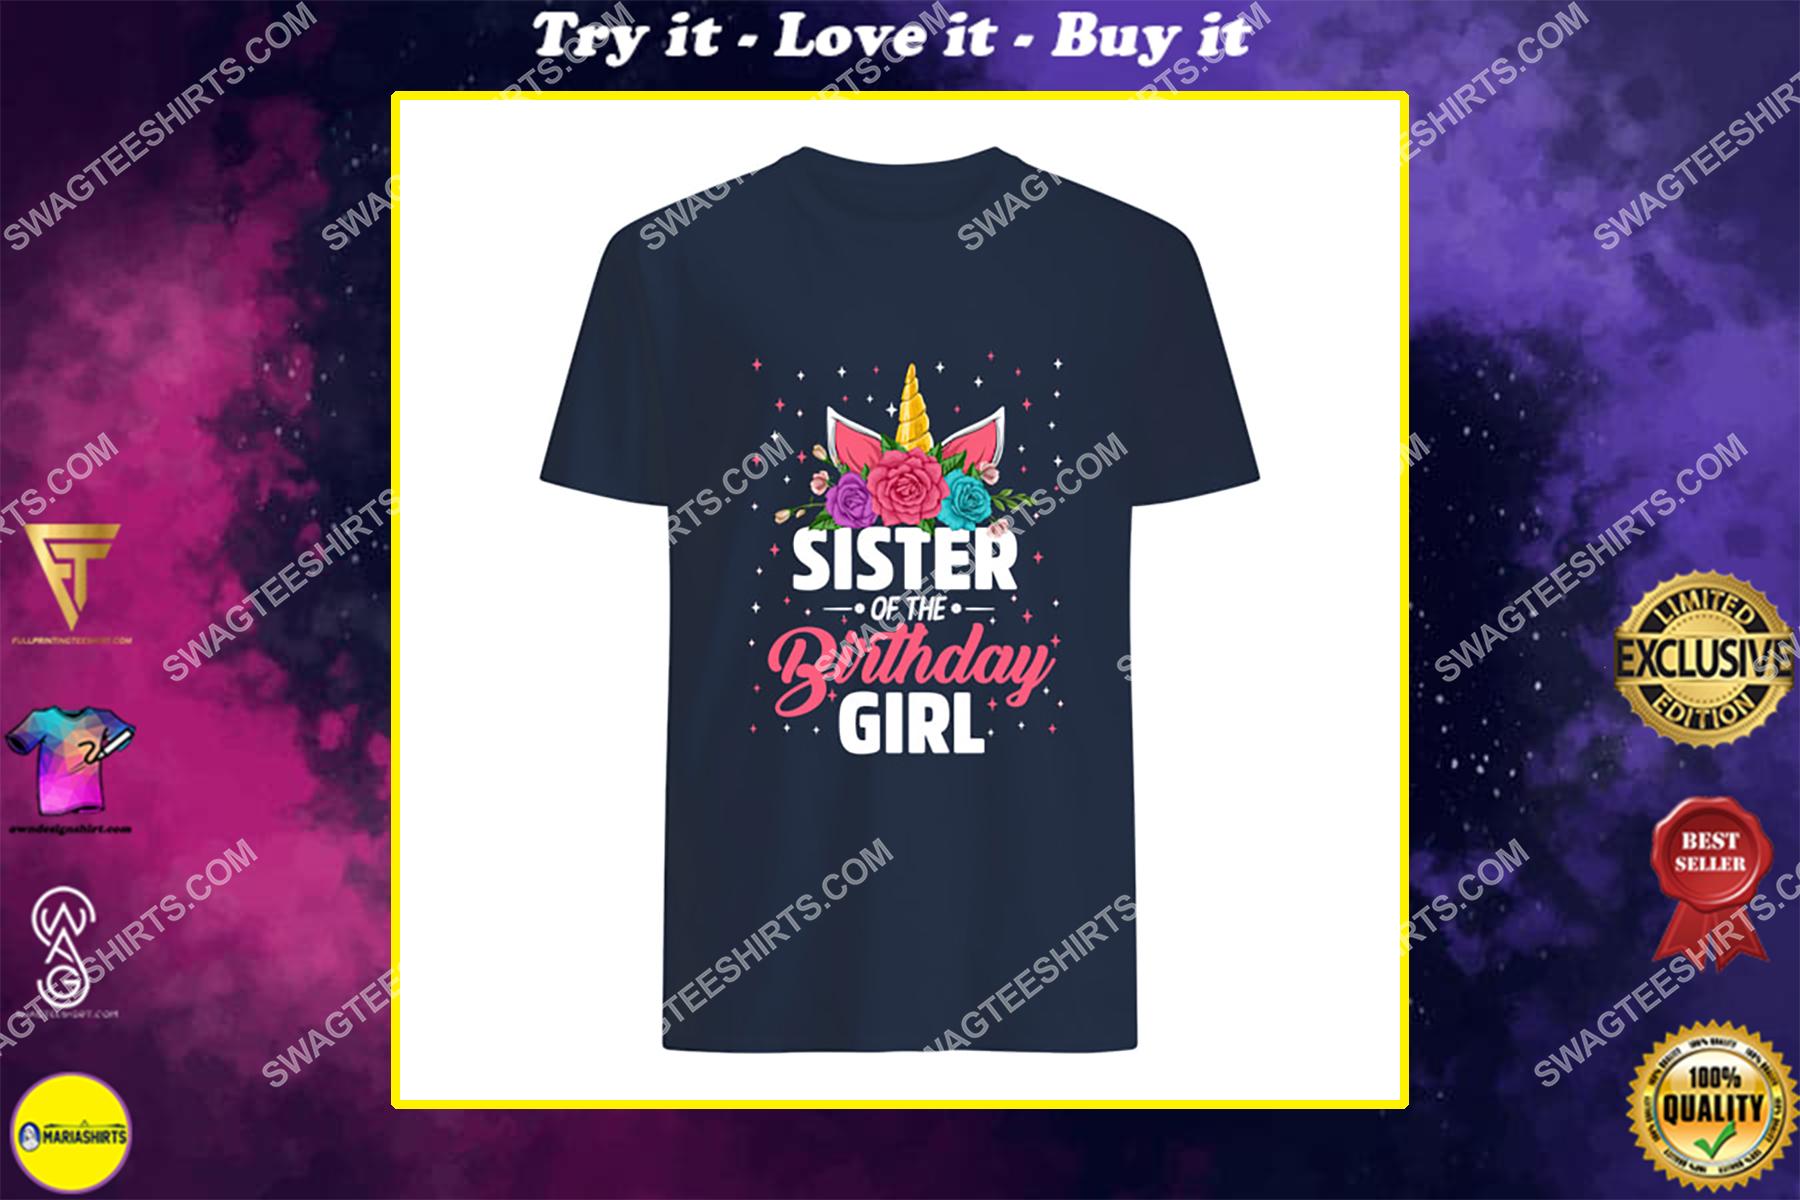 unicorns sister of the birthday girl for birthday gift shirt